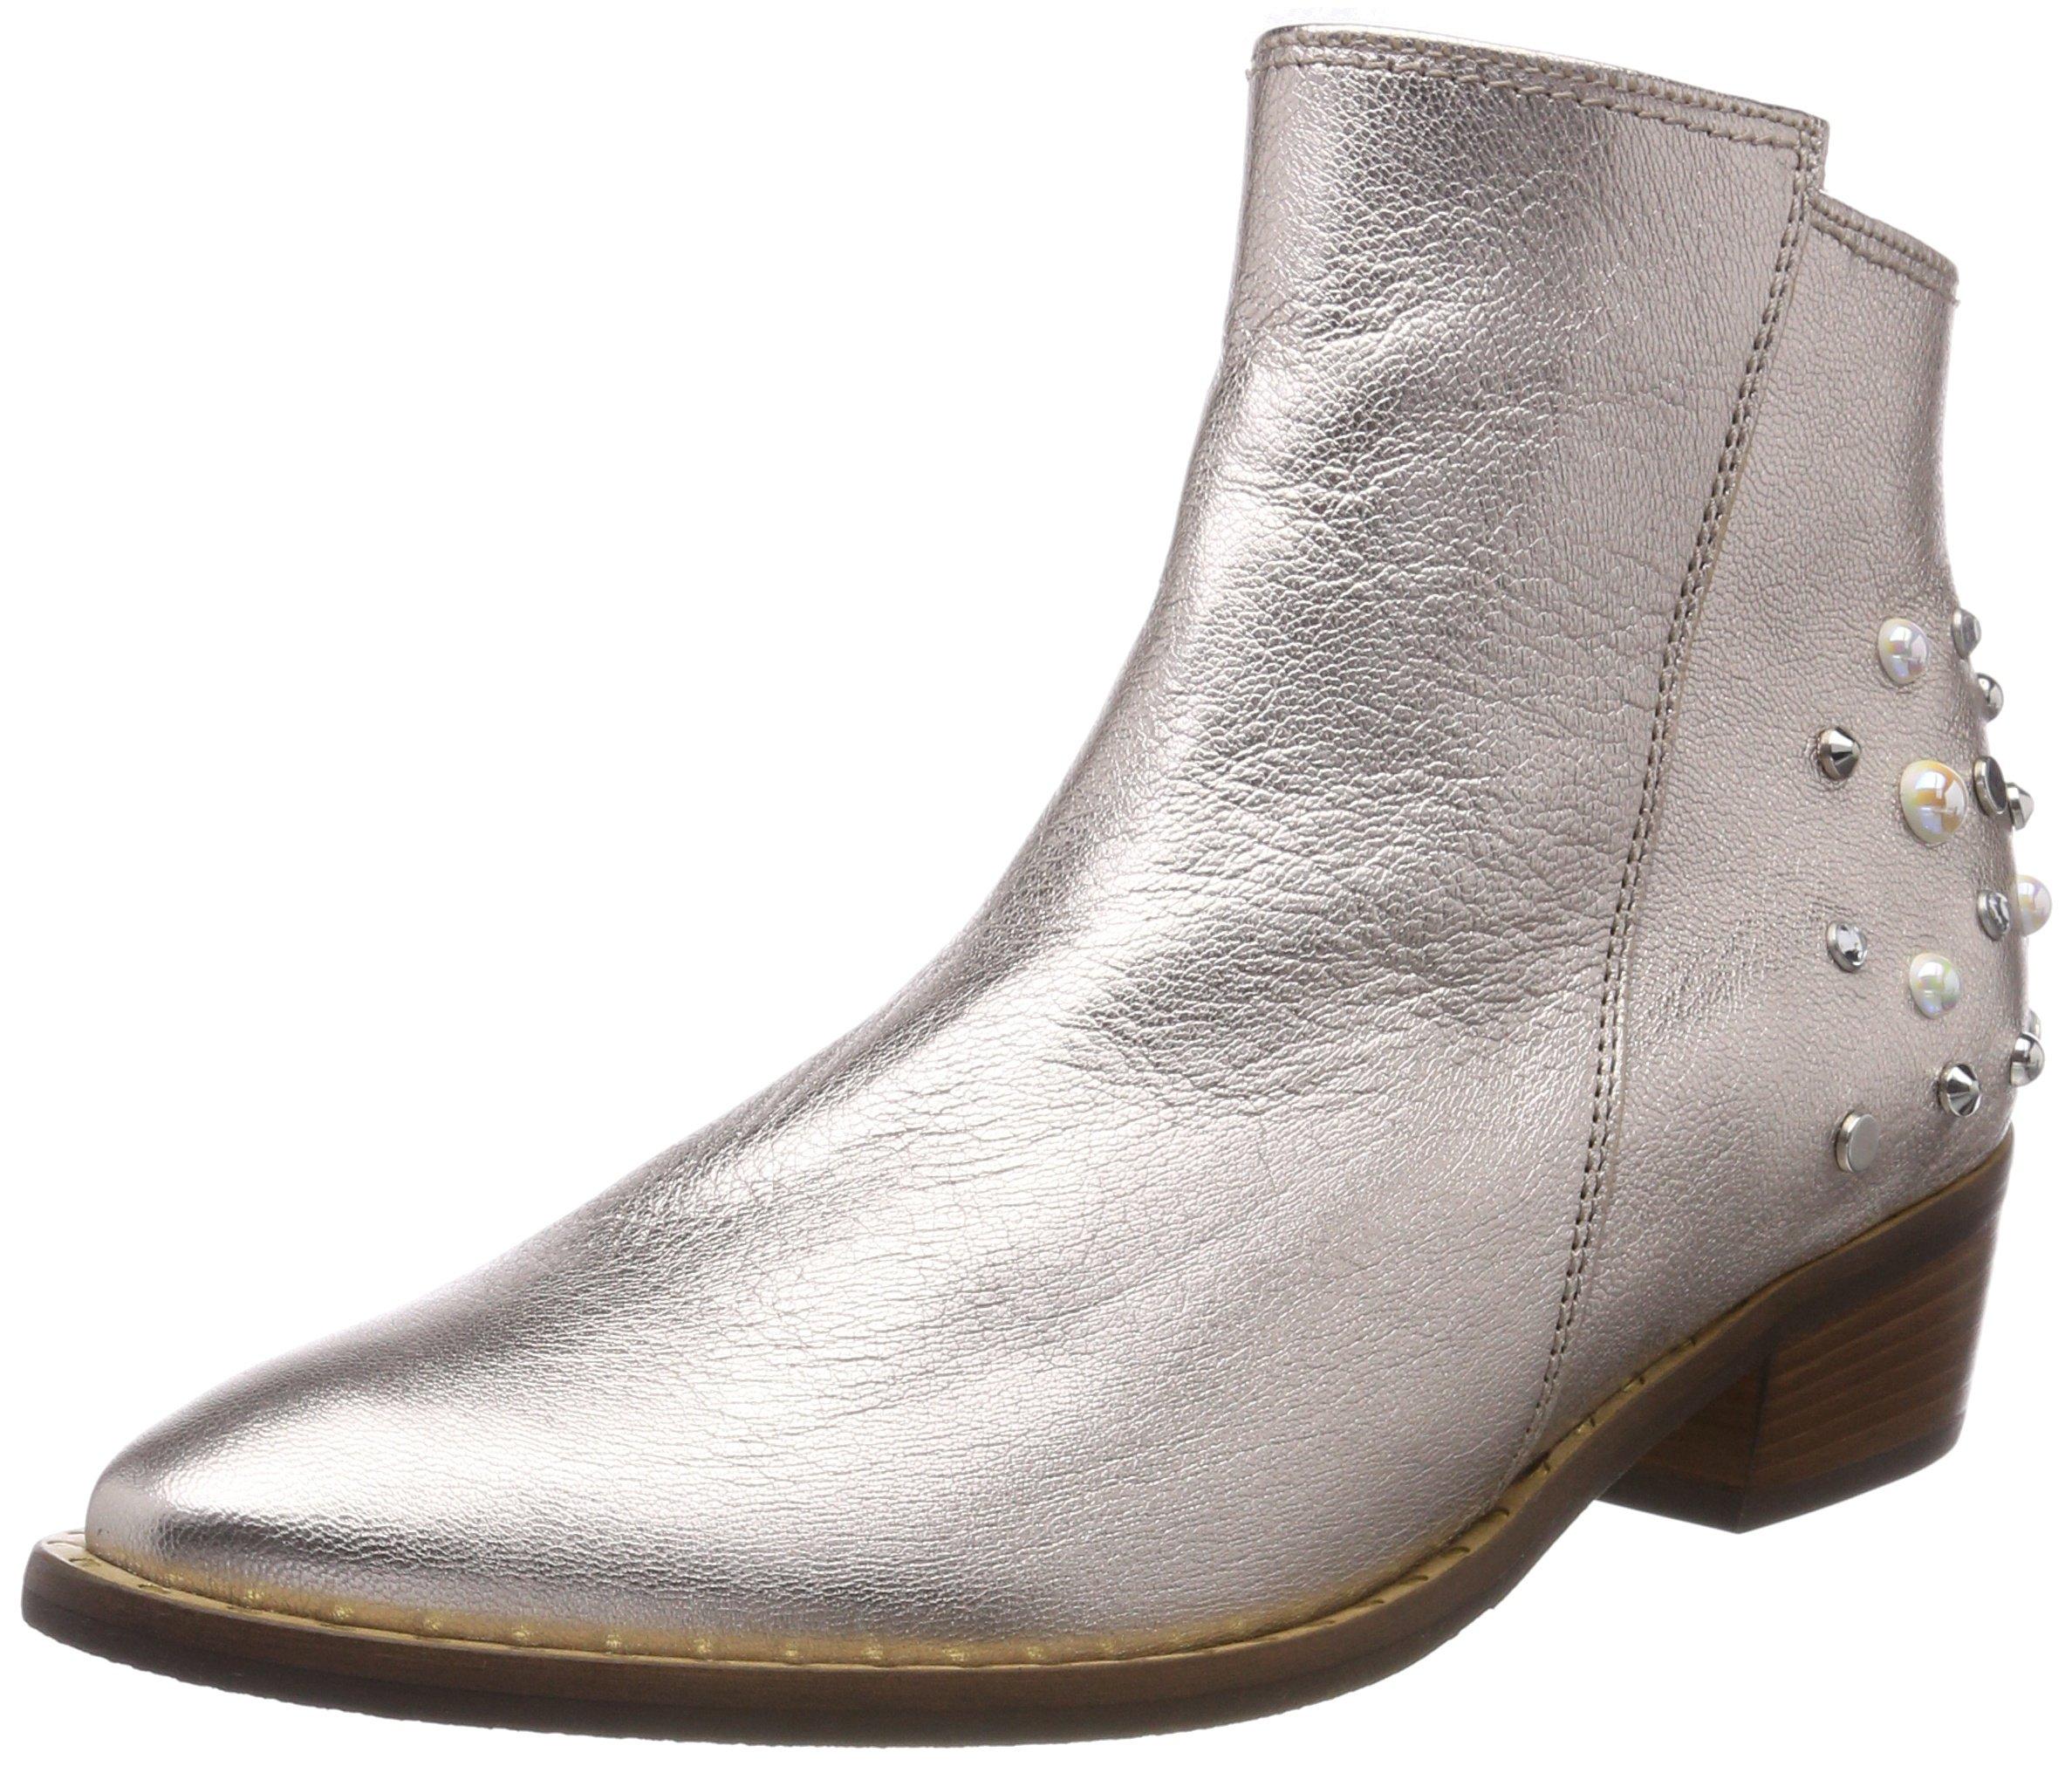 Comfort Micro39 SportBotines Shoes Eu FemmeBeigemuschel Gabor oWQrdexBC